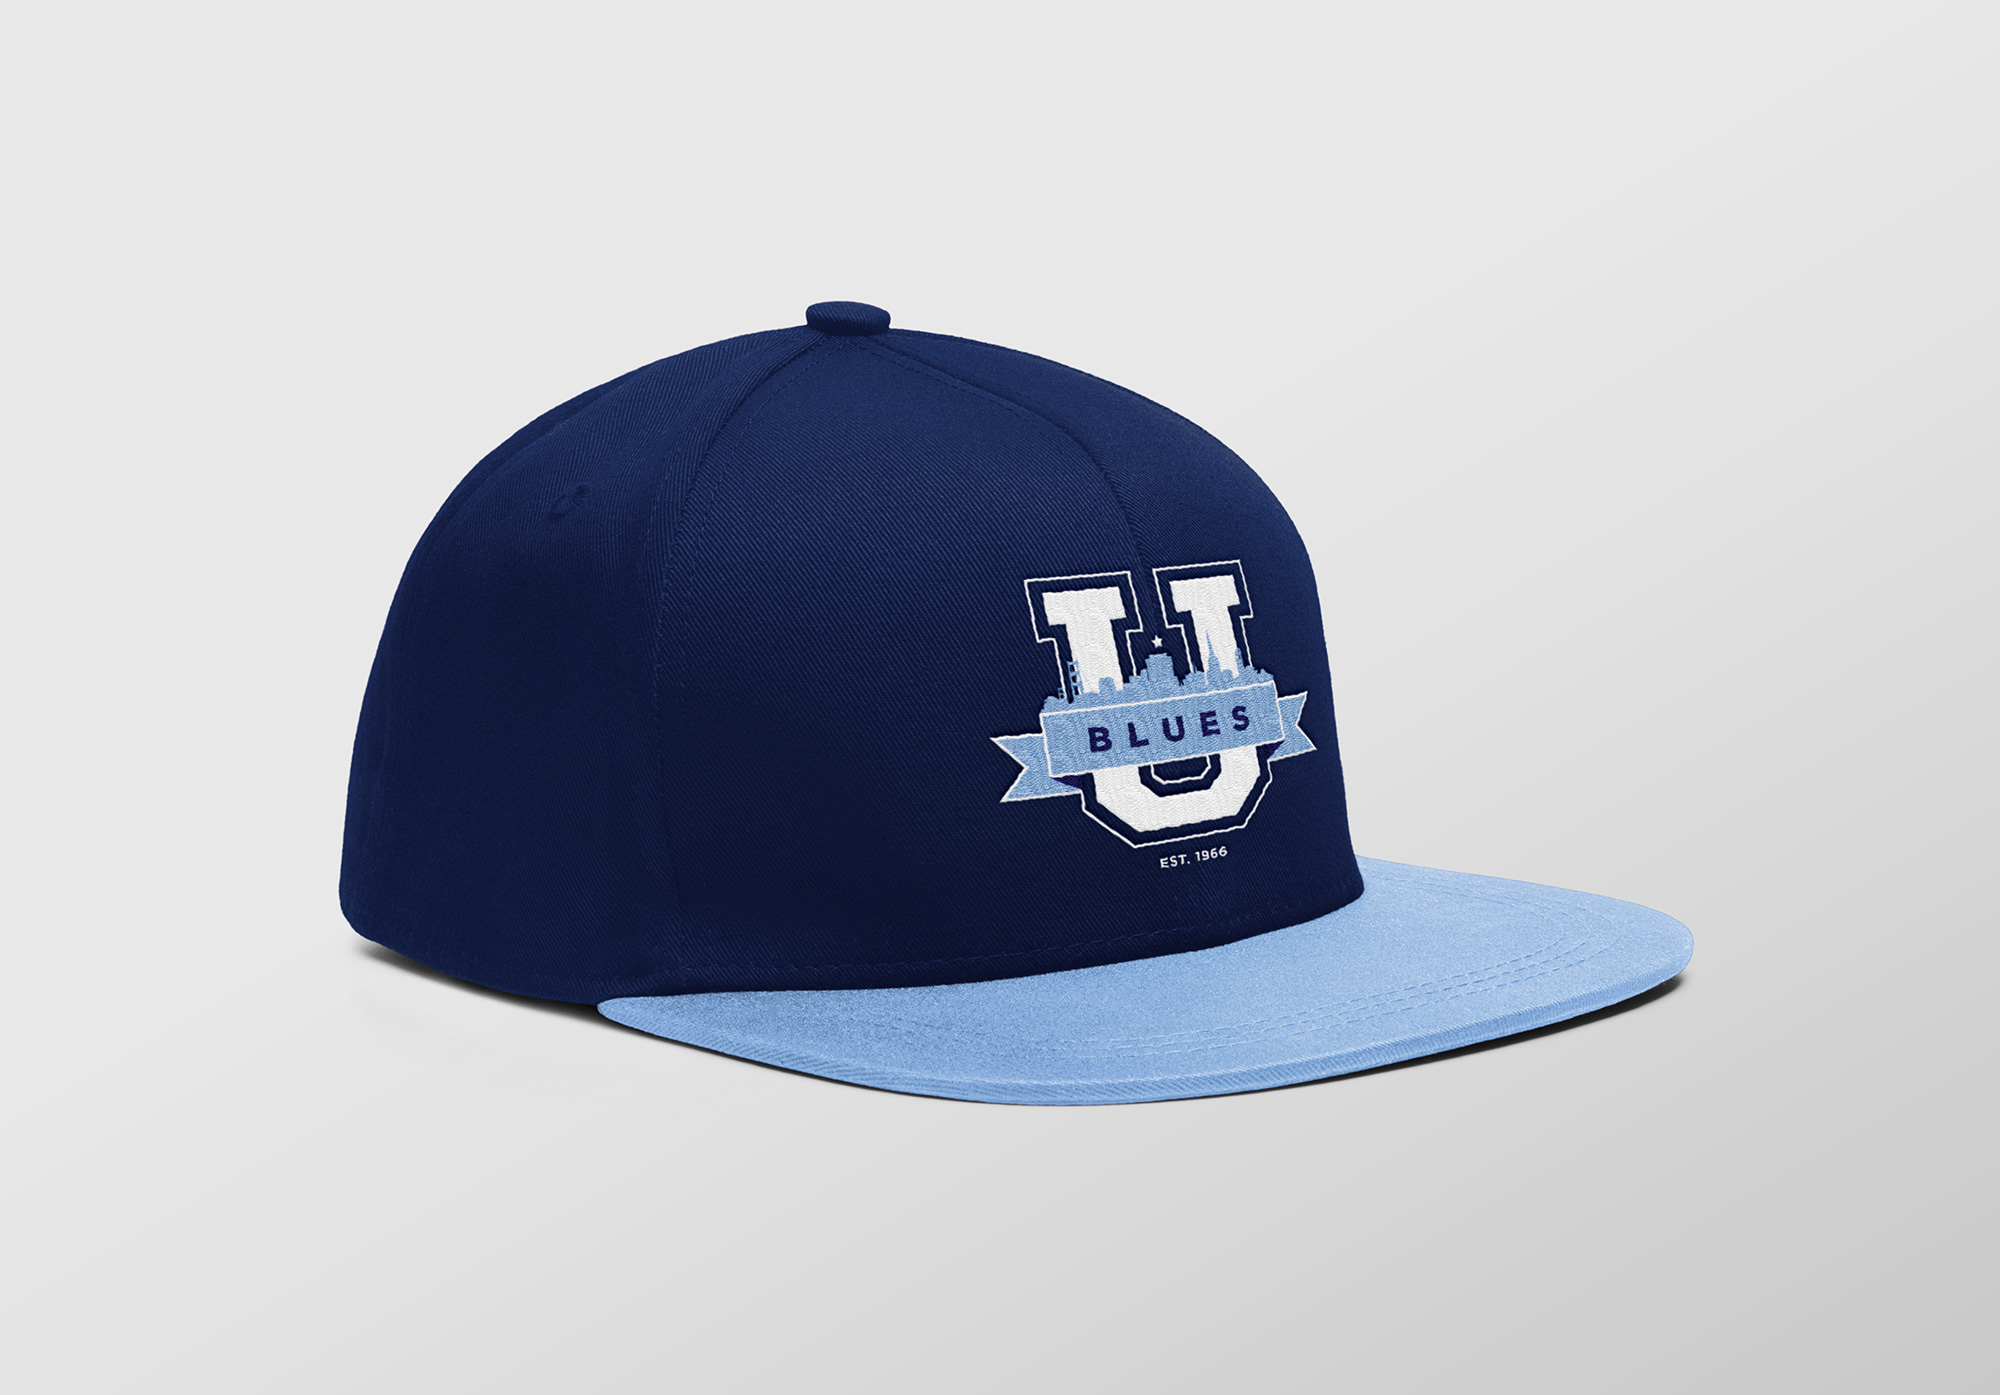 blues_hat.jpg